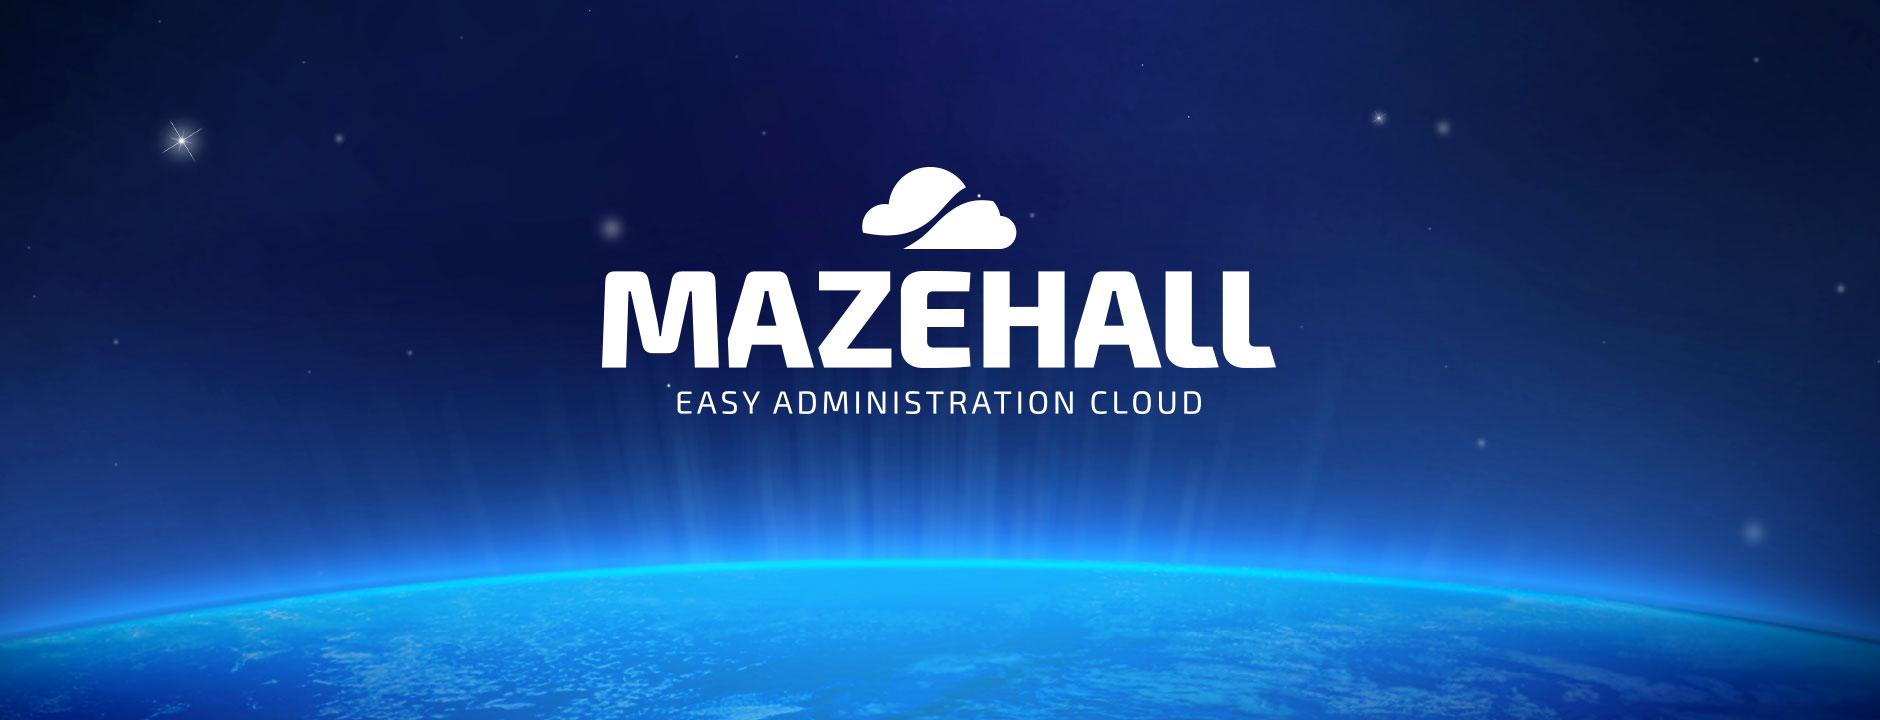 Mazehall - Design